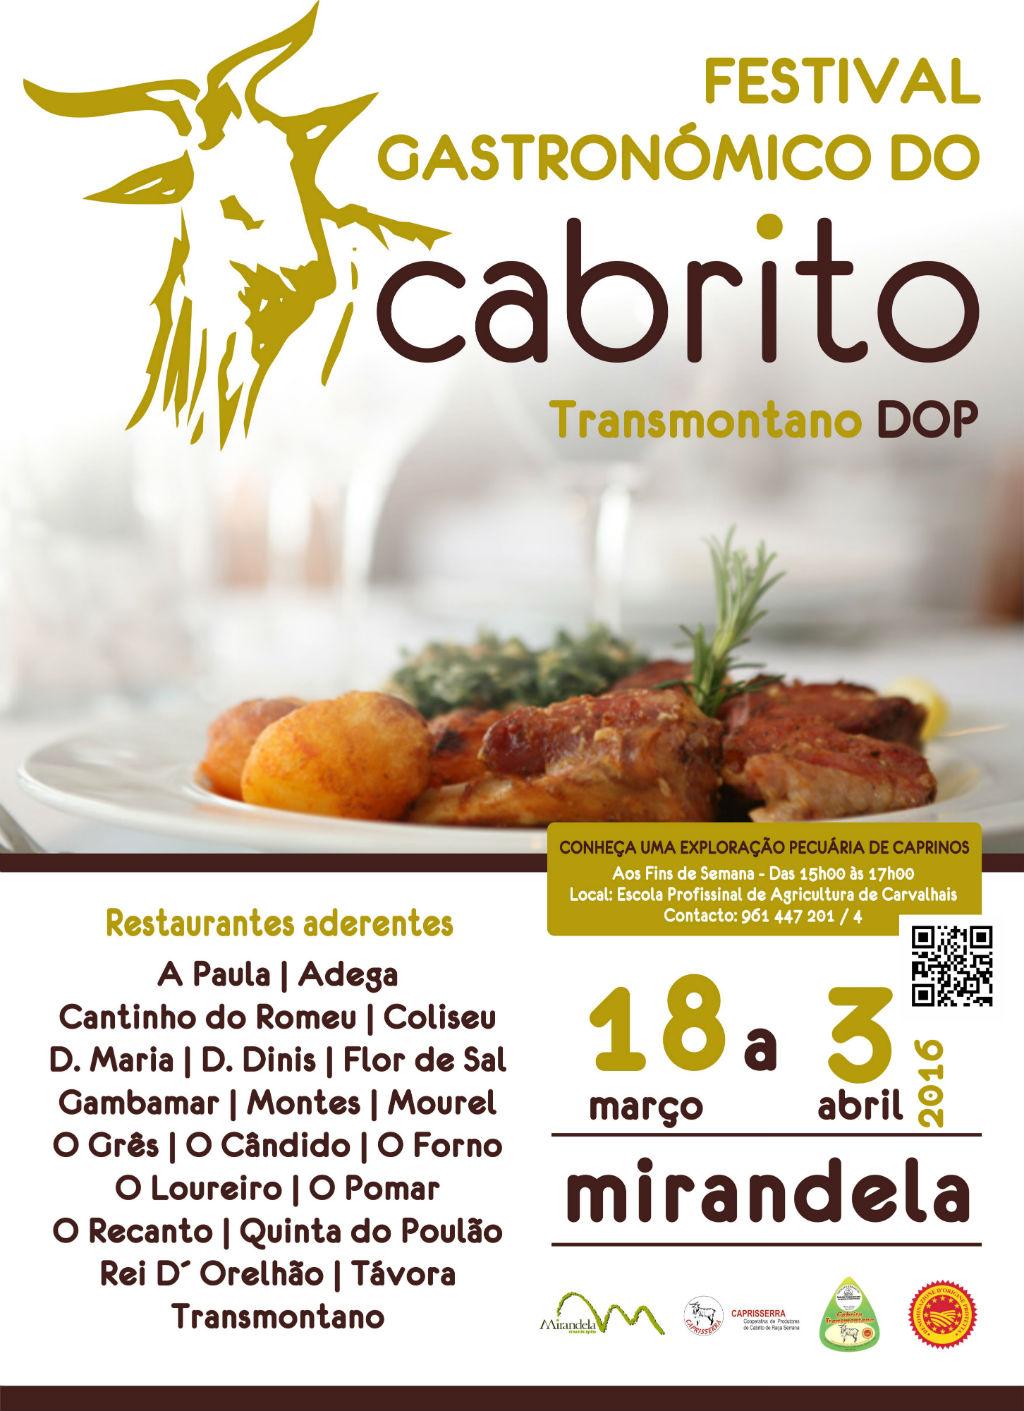 Mirandela Turismo / Festival Gastronómico do Cabrito